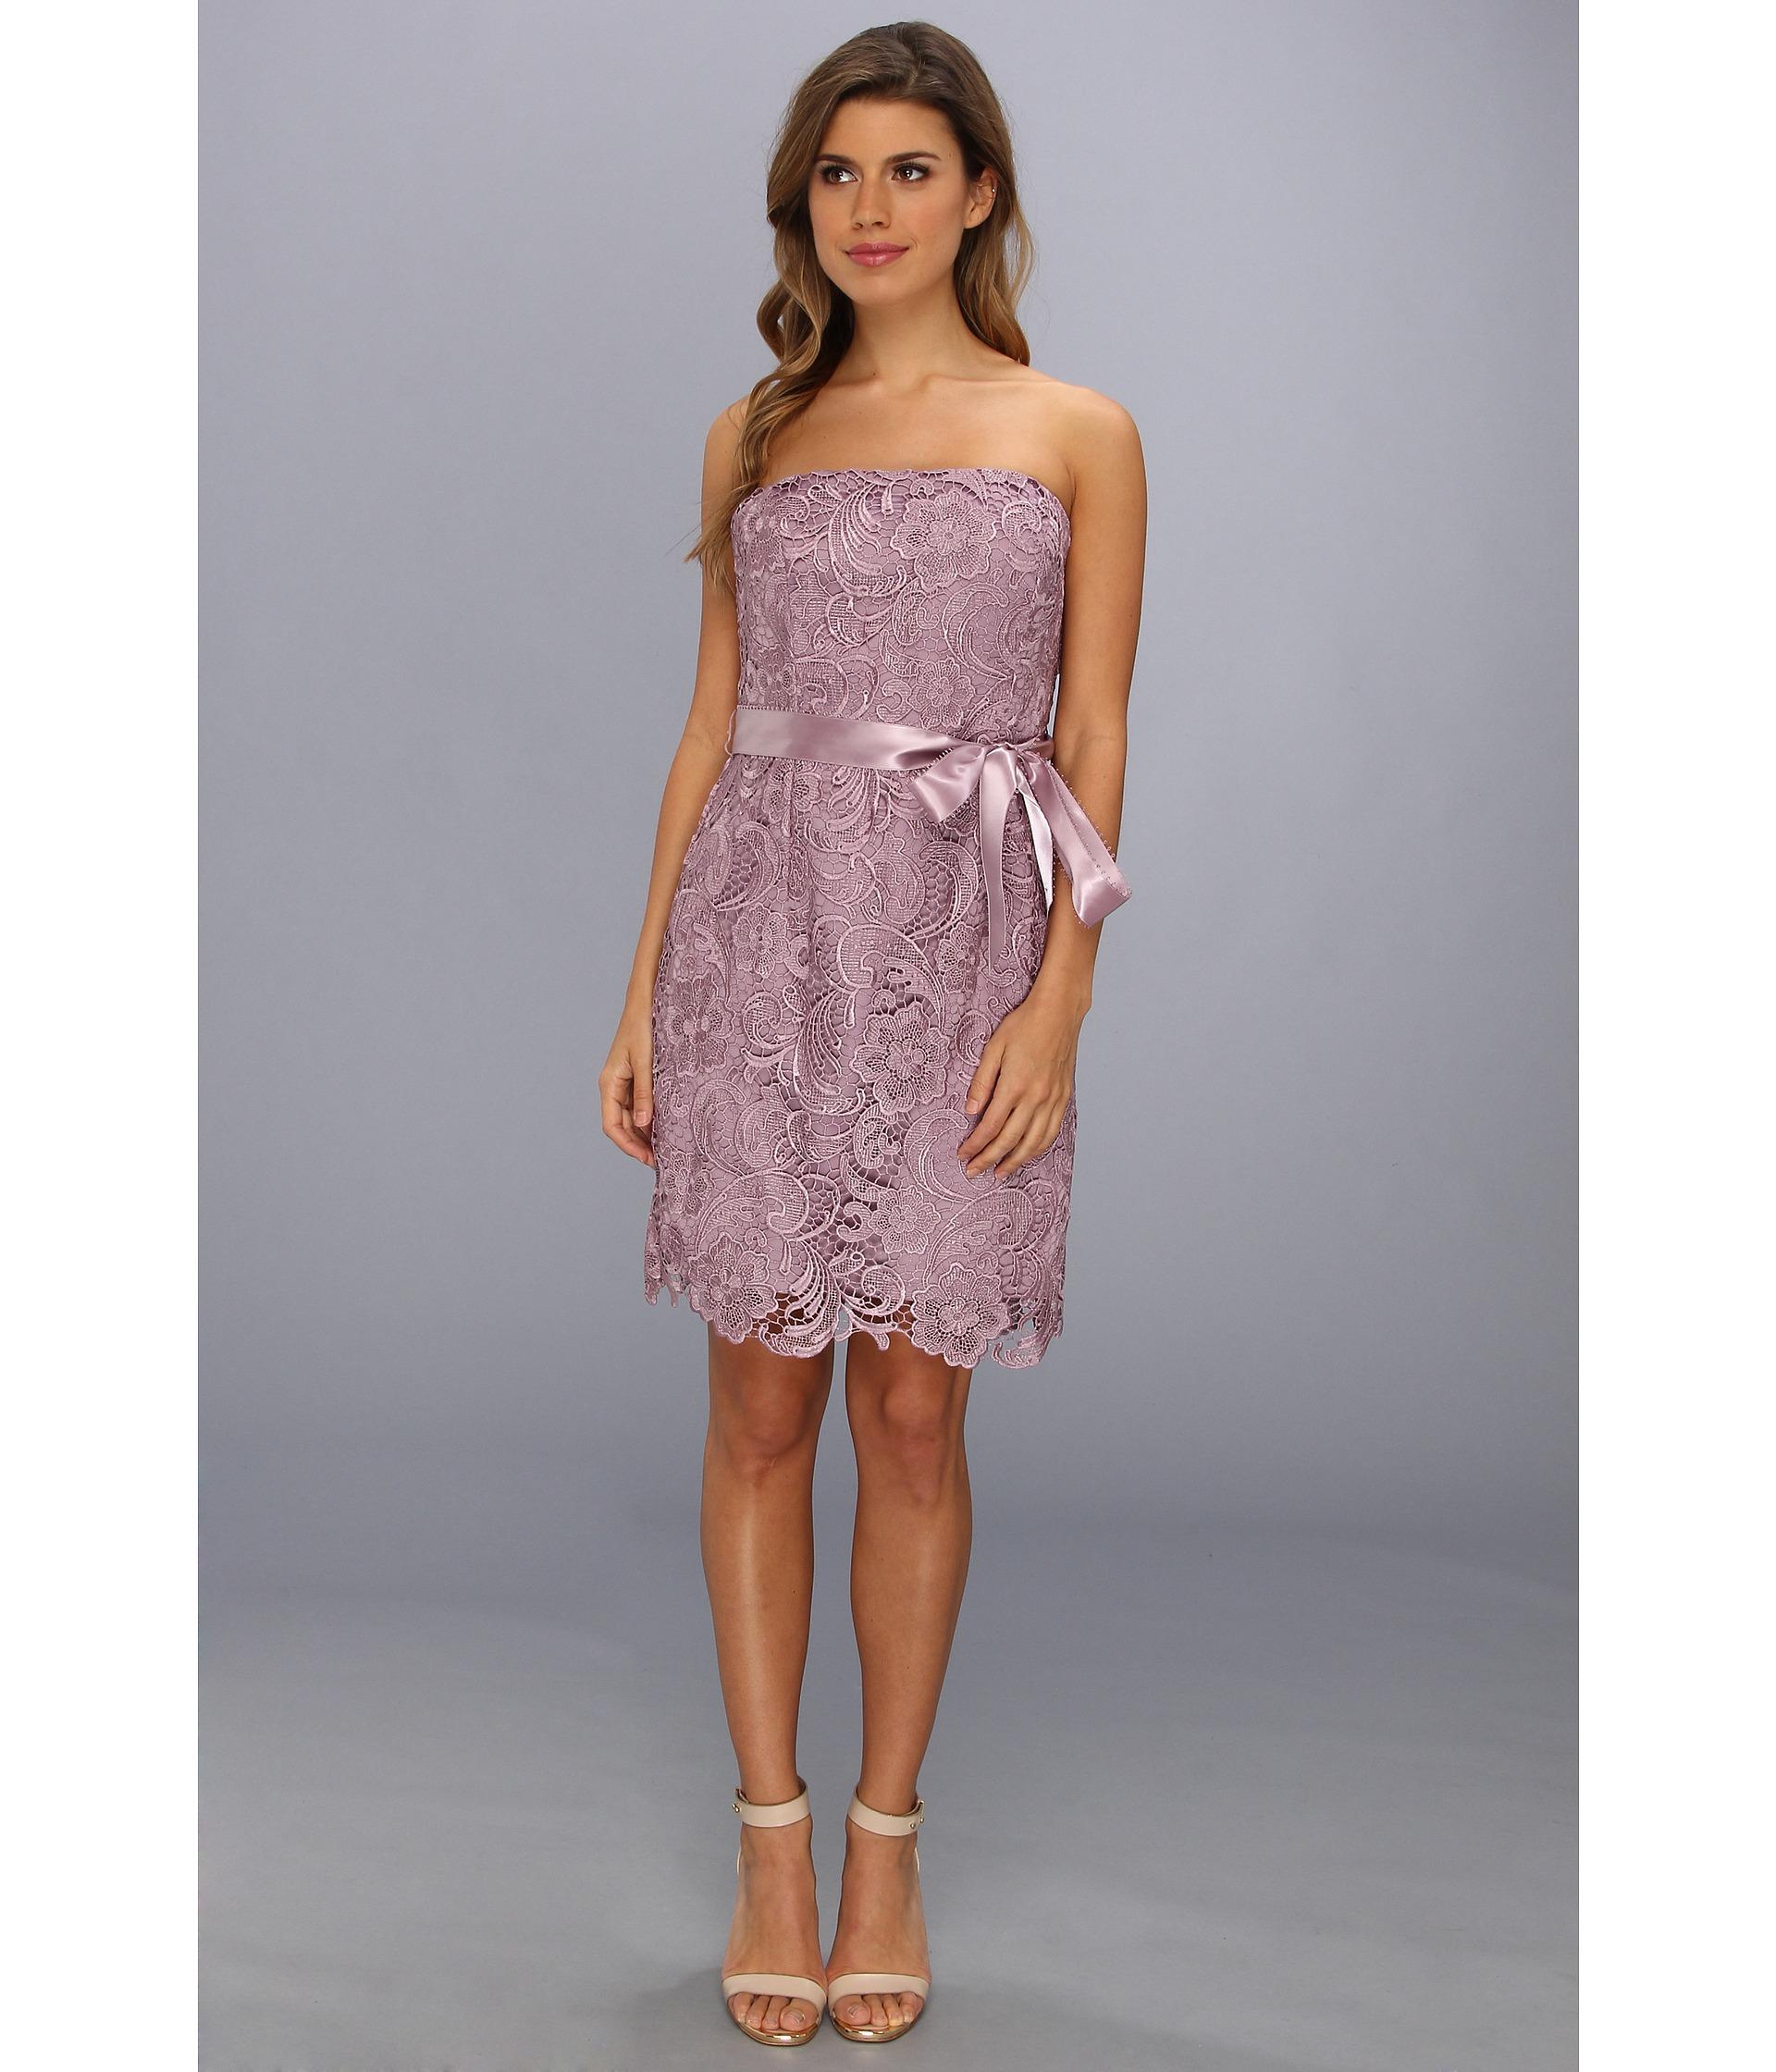 Adrianna Papell, Dresses, Women at 6pm.com